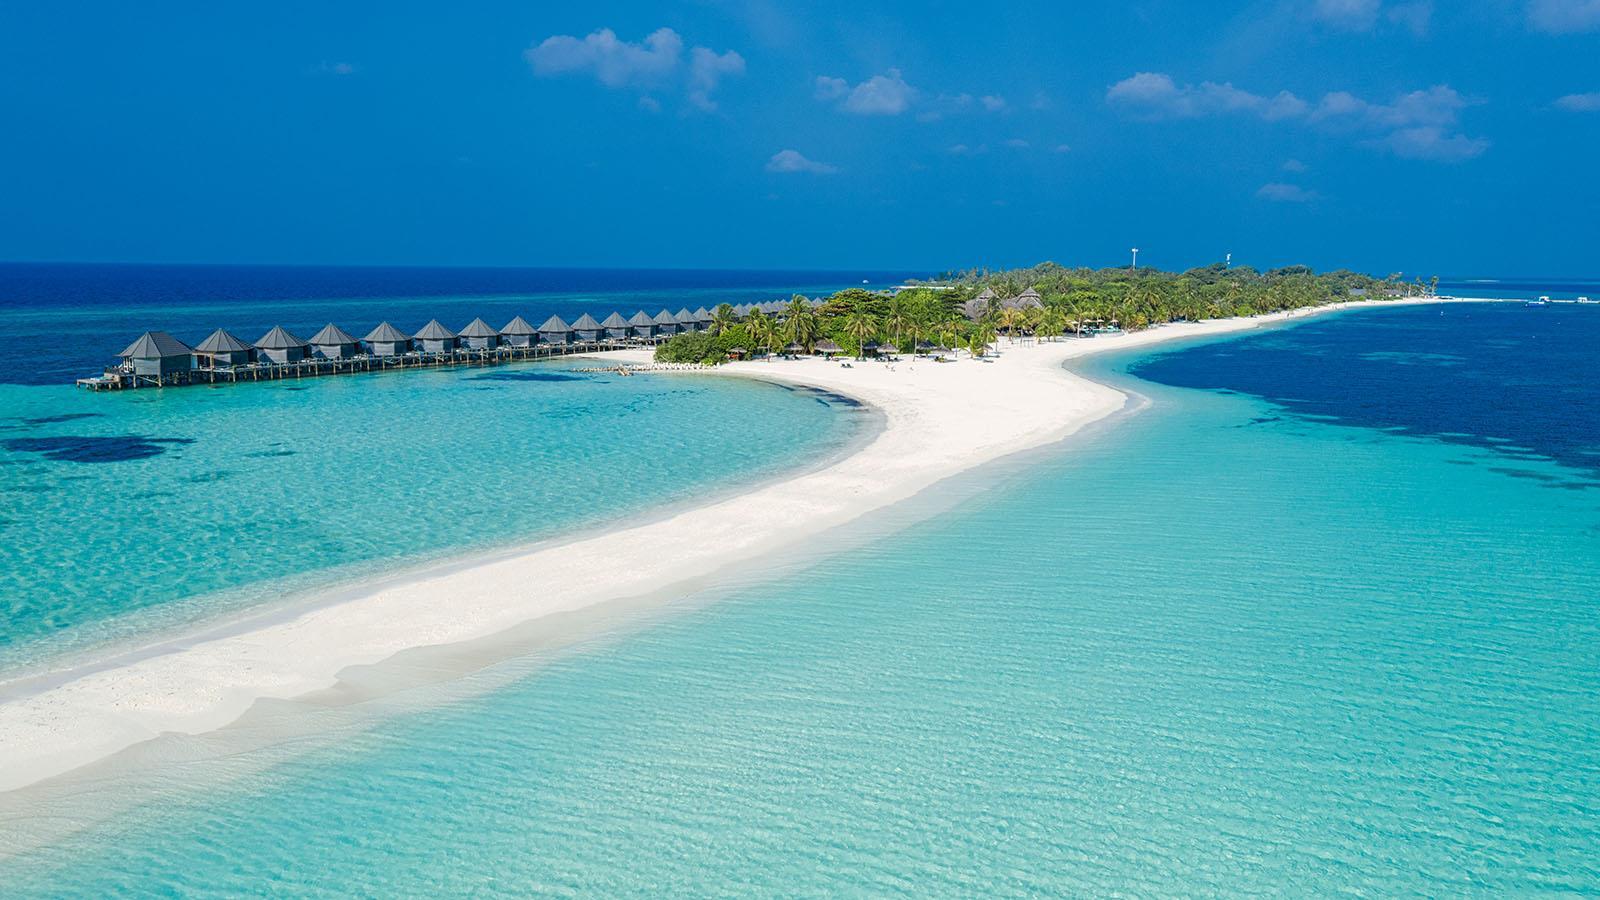 kuredu-island-resort-spa-genel-001